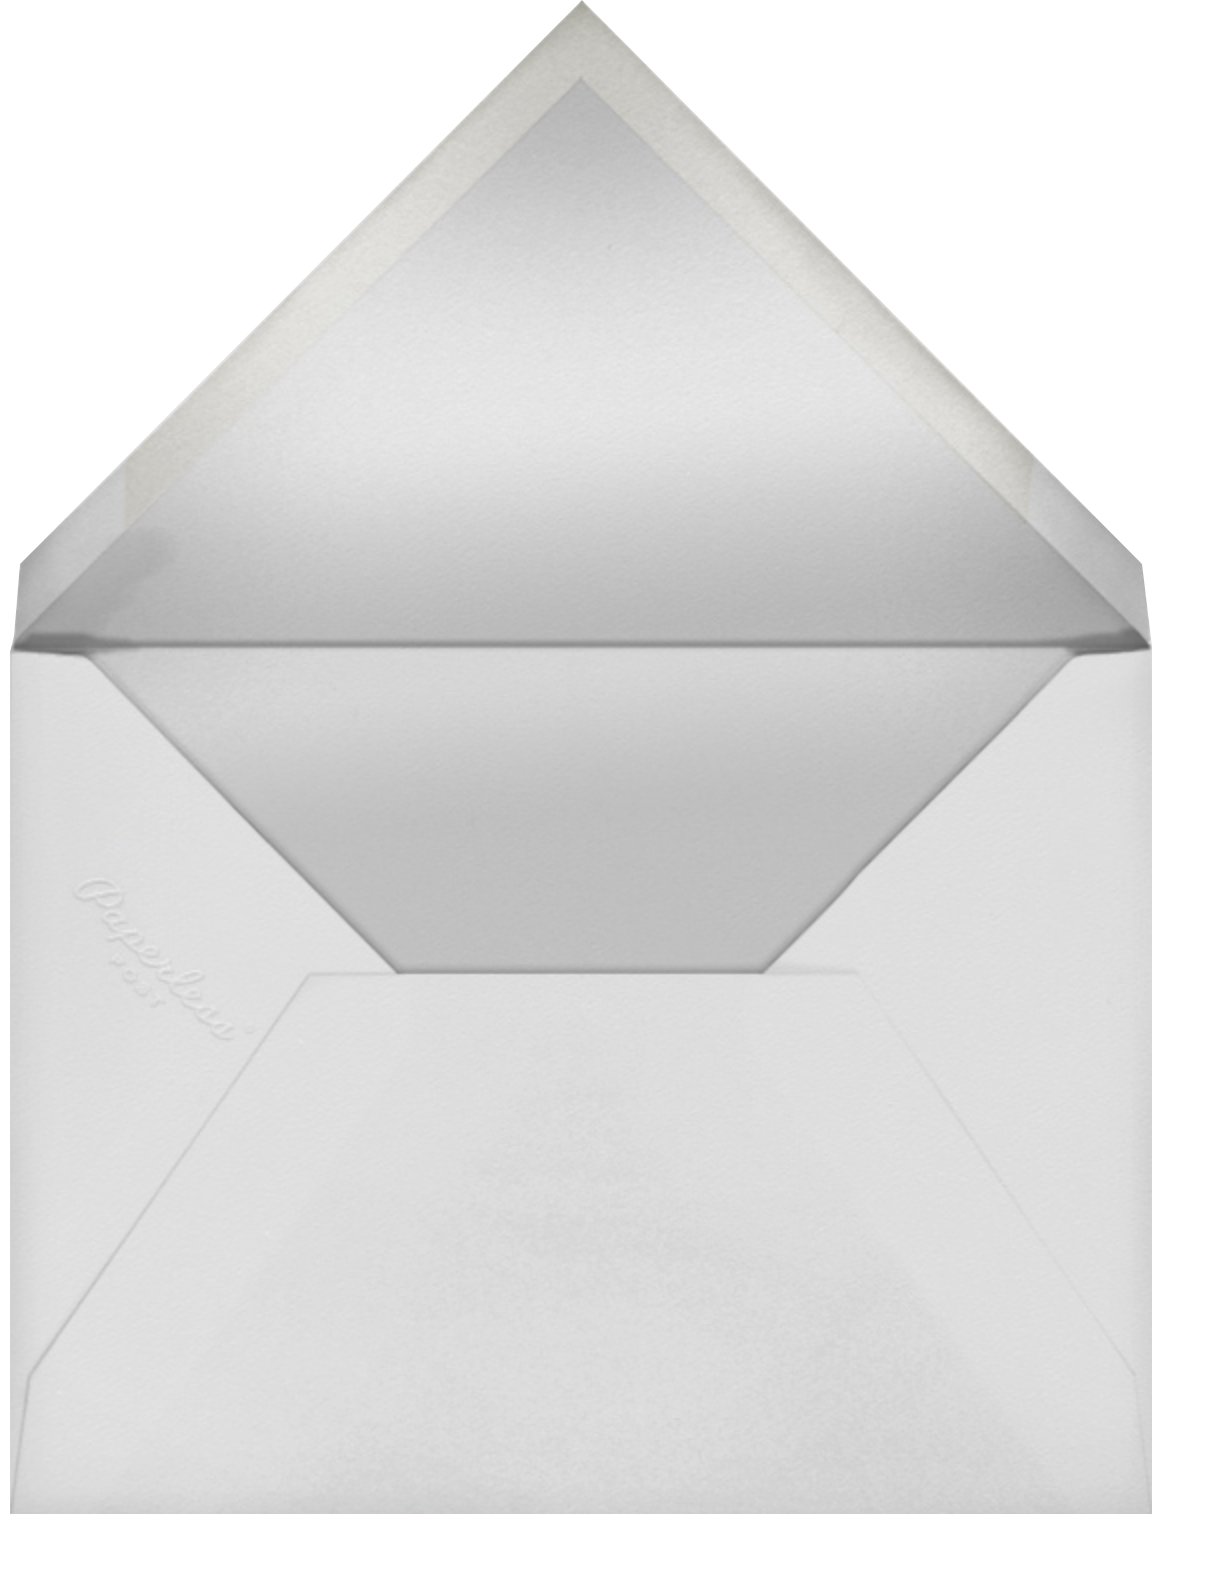 Tea Tree (Program) - Black - Rifle Paper Co. - Menus and programs - envelope back